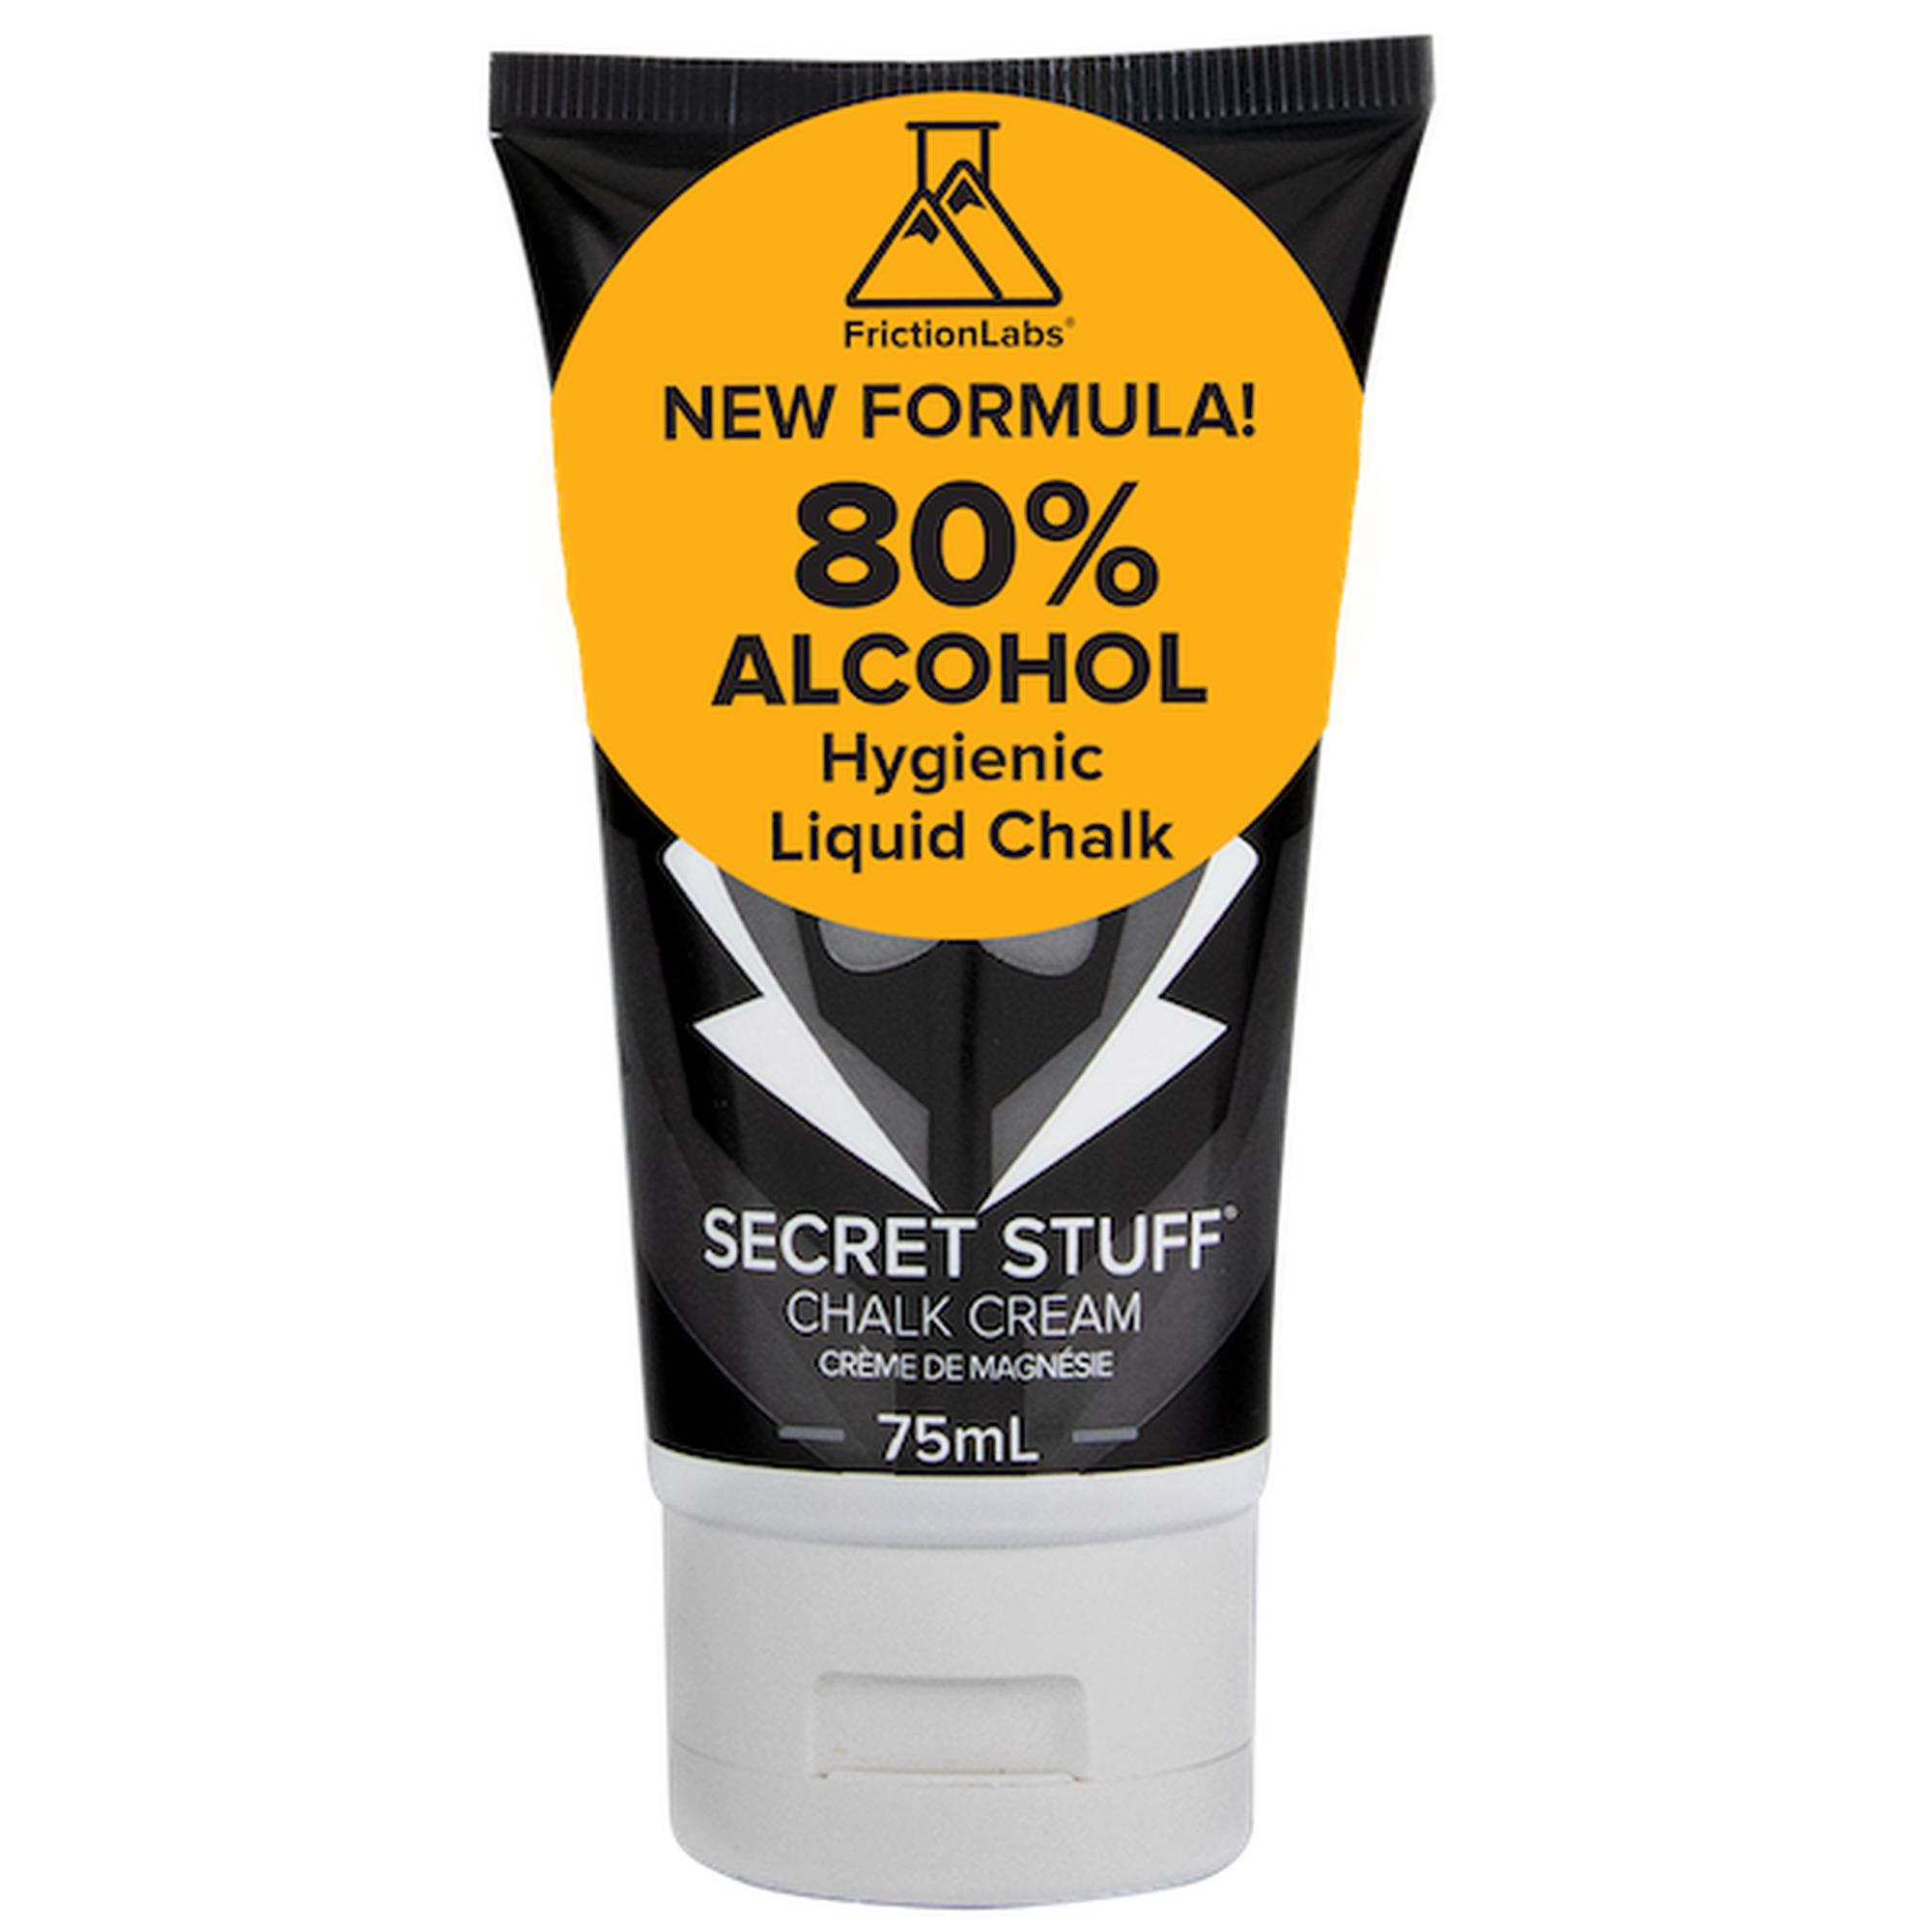 FrictionLabs Secret Stuff Hygienic Liquid Chalk